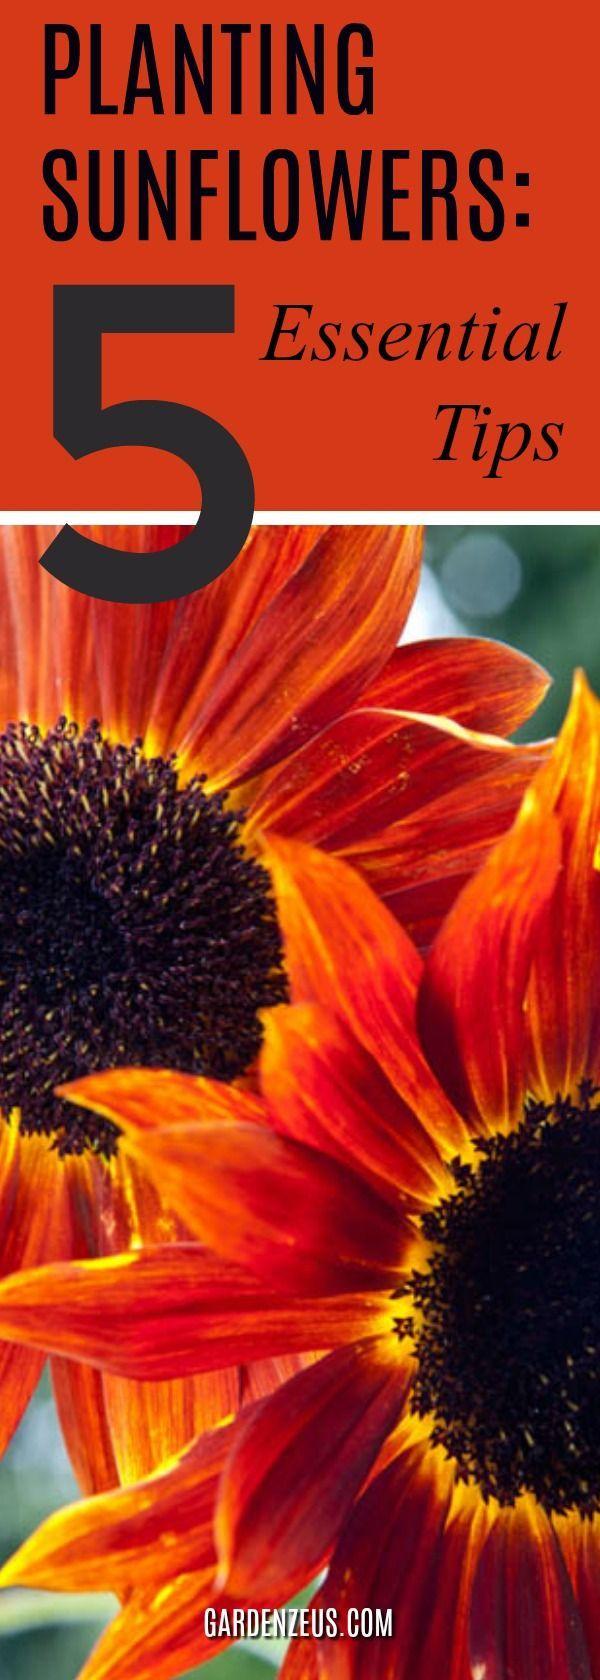 Planting Sunflowers: Five Essential Tips GardenZeus